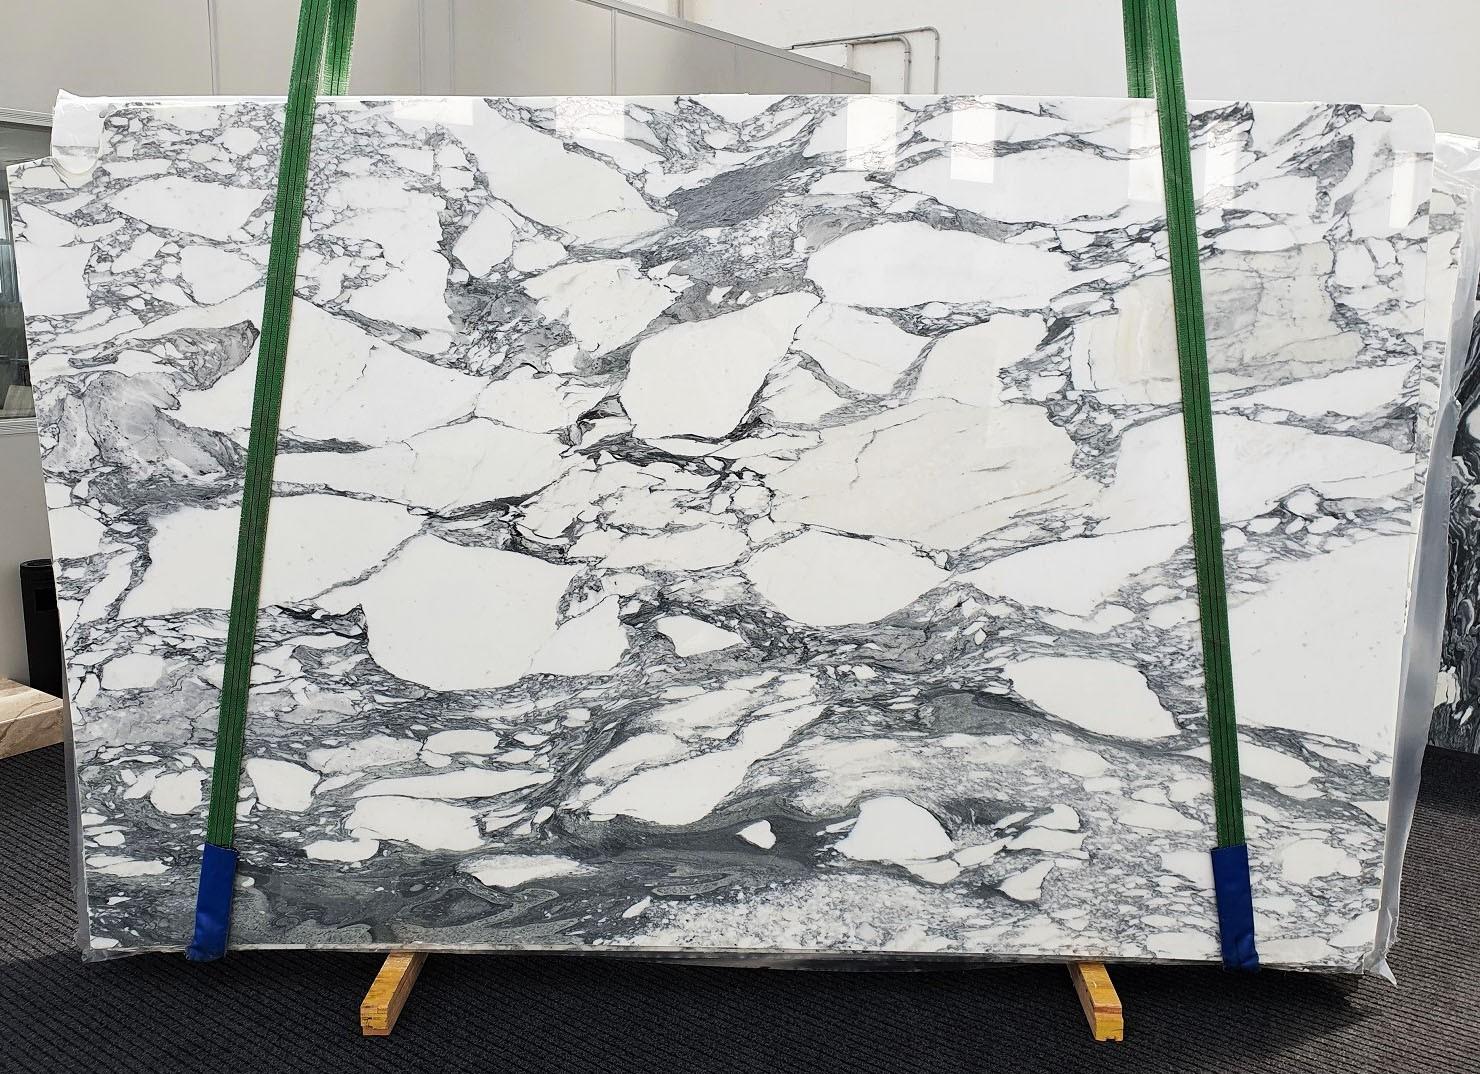 ARABESCATO CORCHIA polierte Unmaßplatten 1433 aus Natur Marmor , Slab #35: Lieferung Veneto, Italien